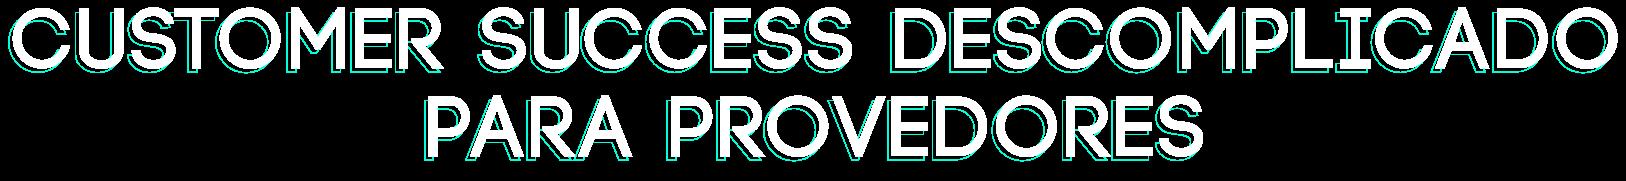 Customer Success Descomplicado para Provedores